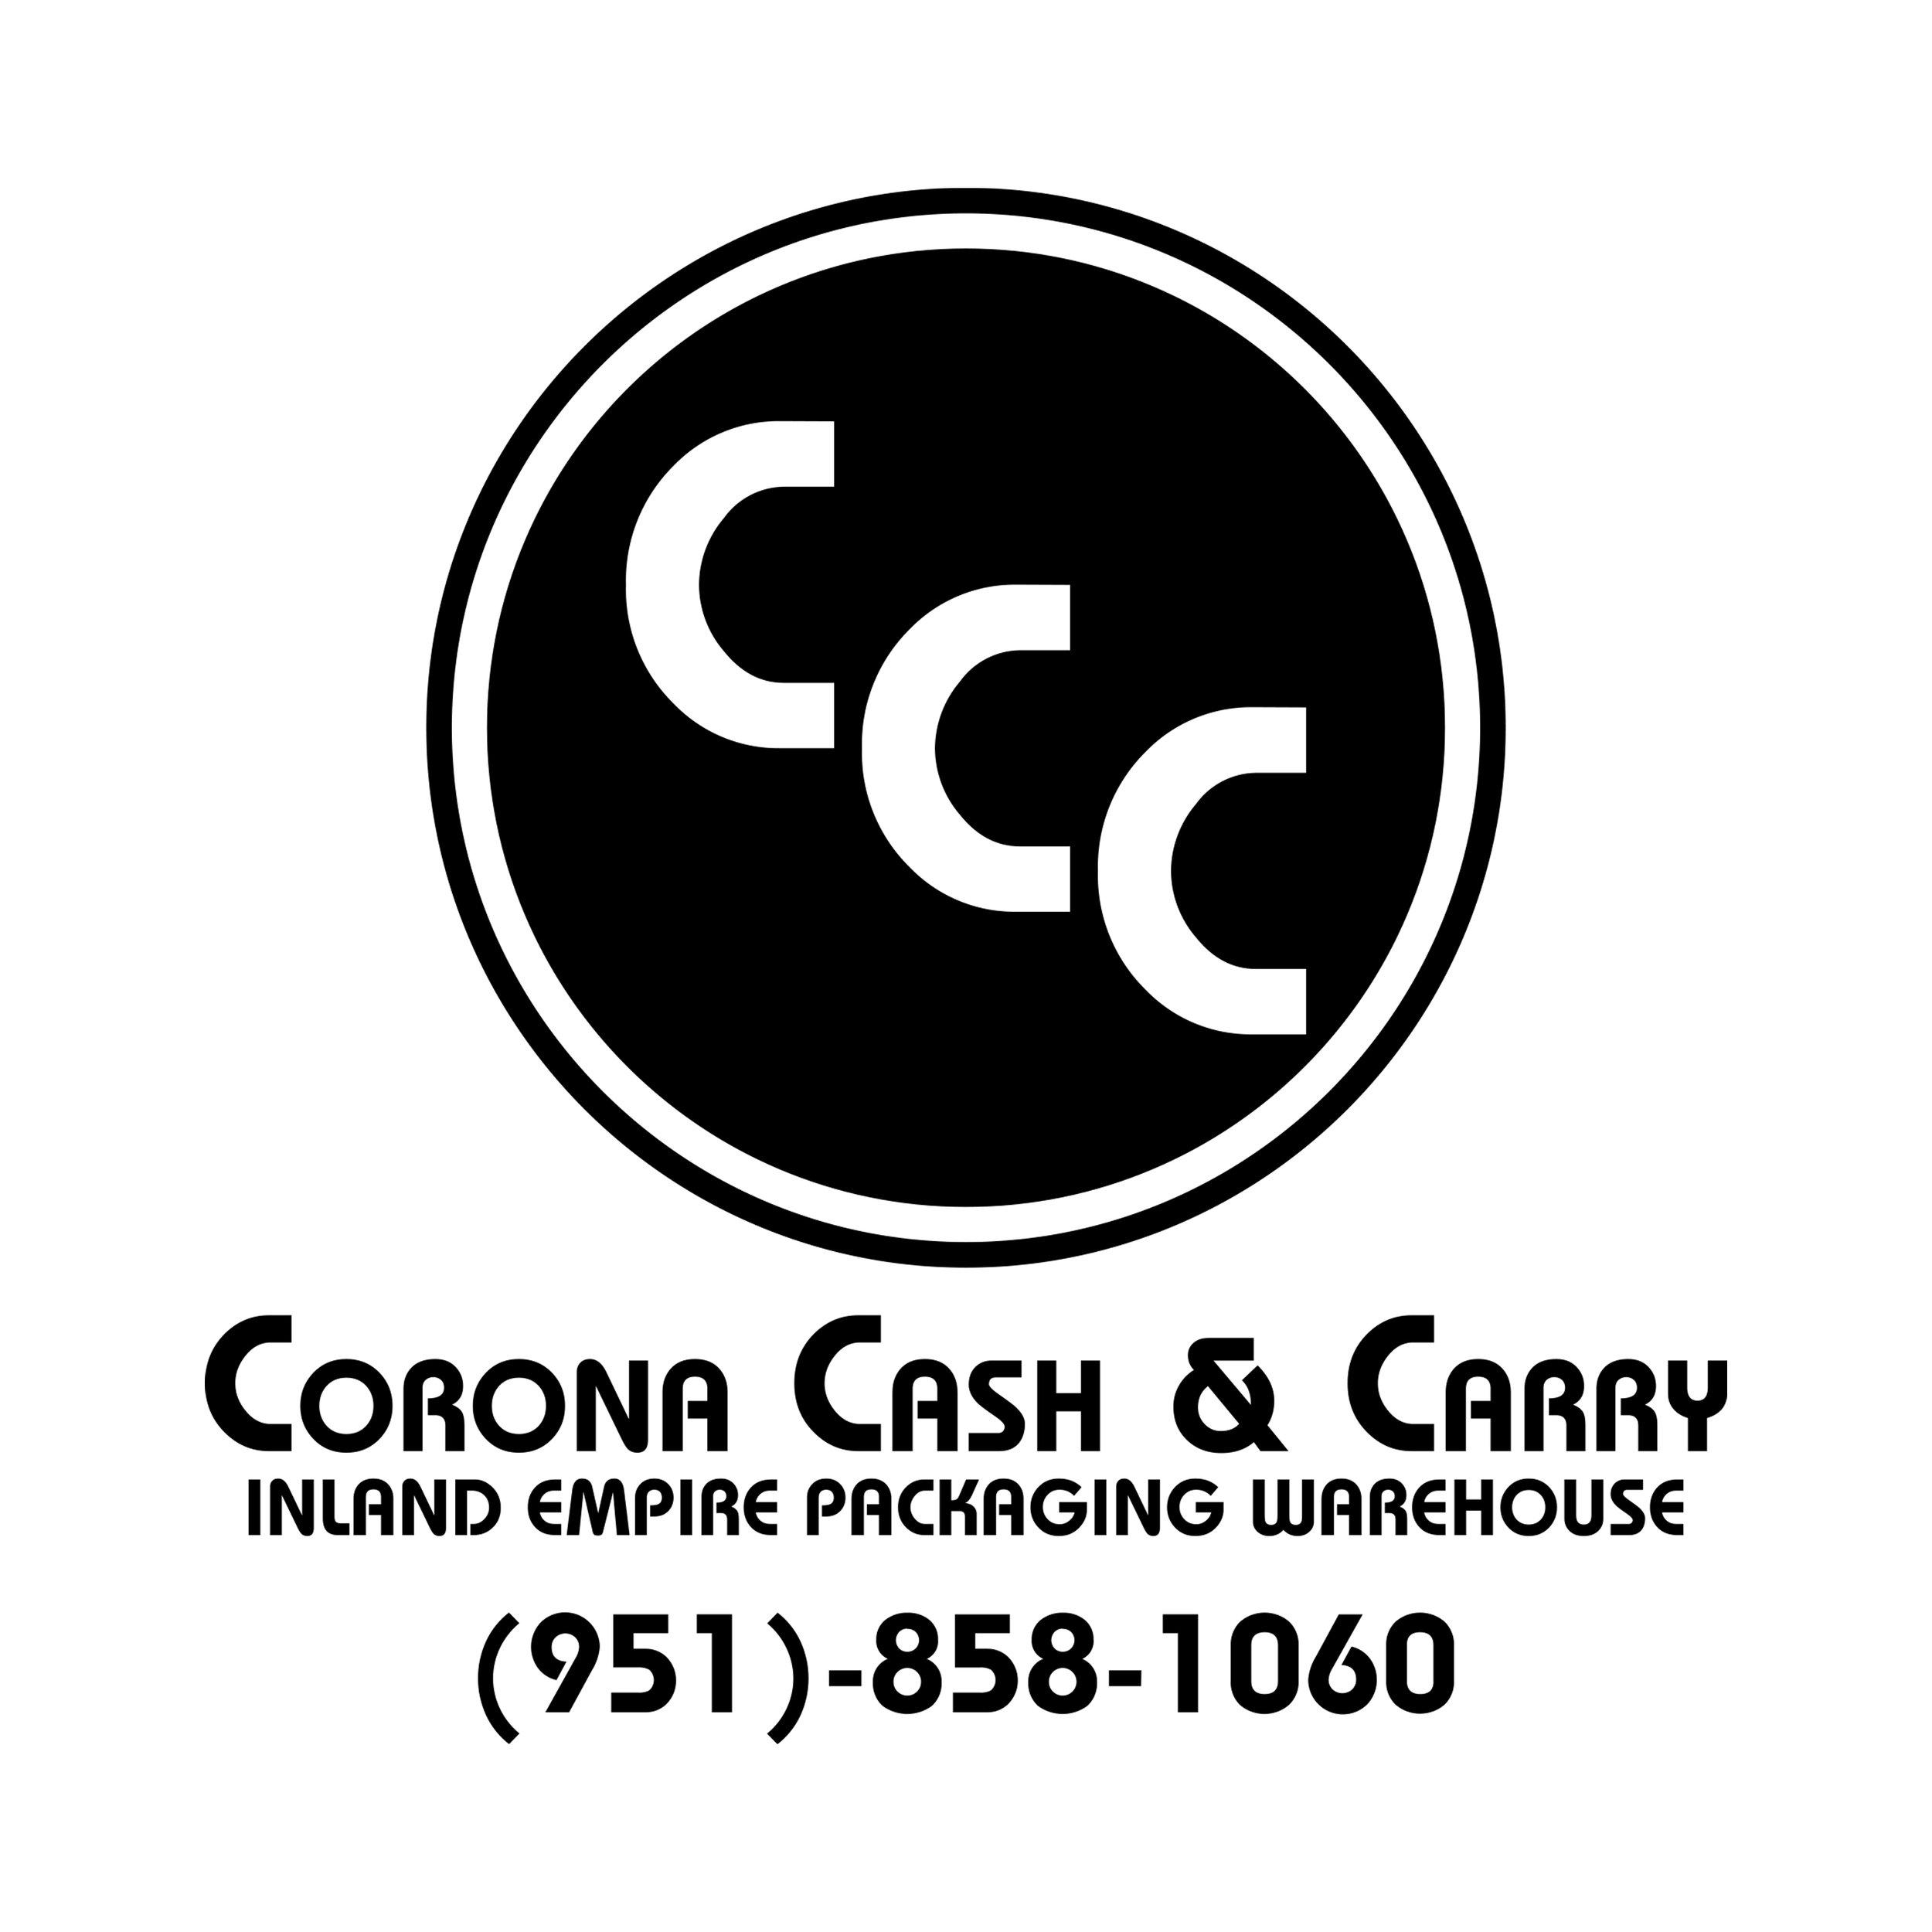 CCC_web1.jpg